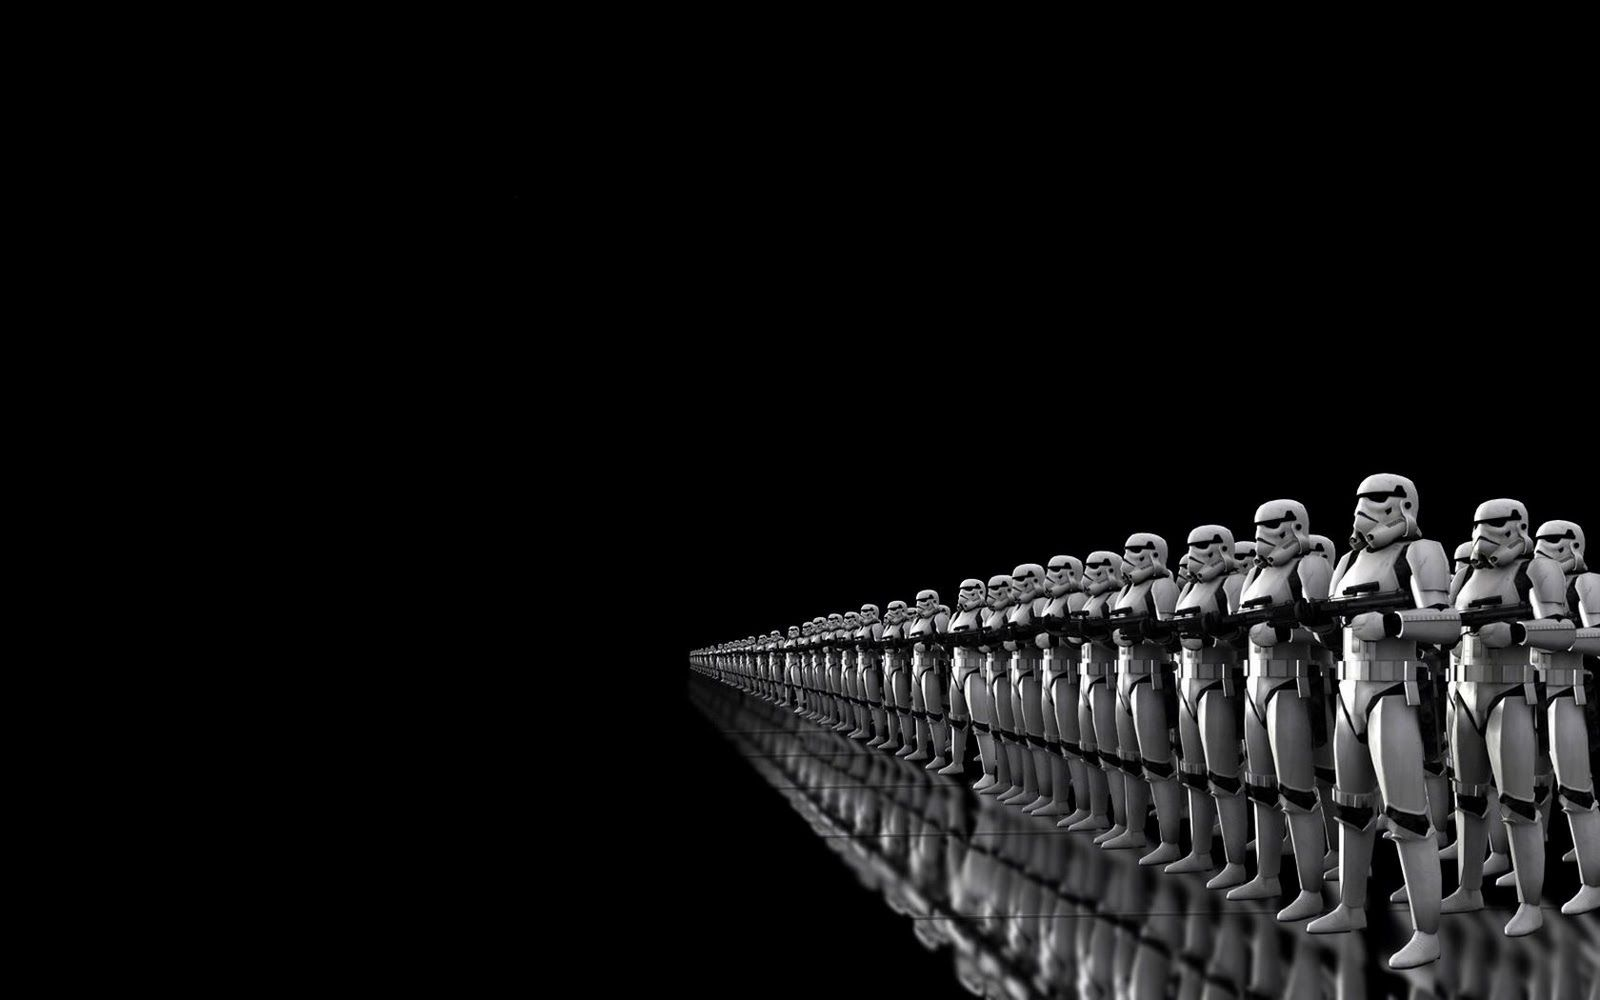 Star Wars Cool Wallpaper In 2020 Star Wars Wallpaper Star Wars Background Star Wars Awesome